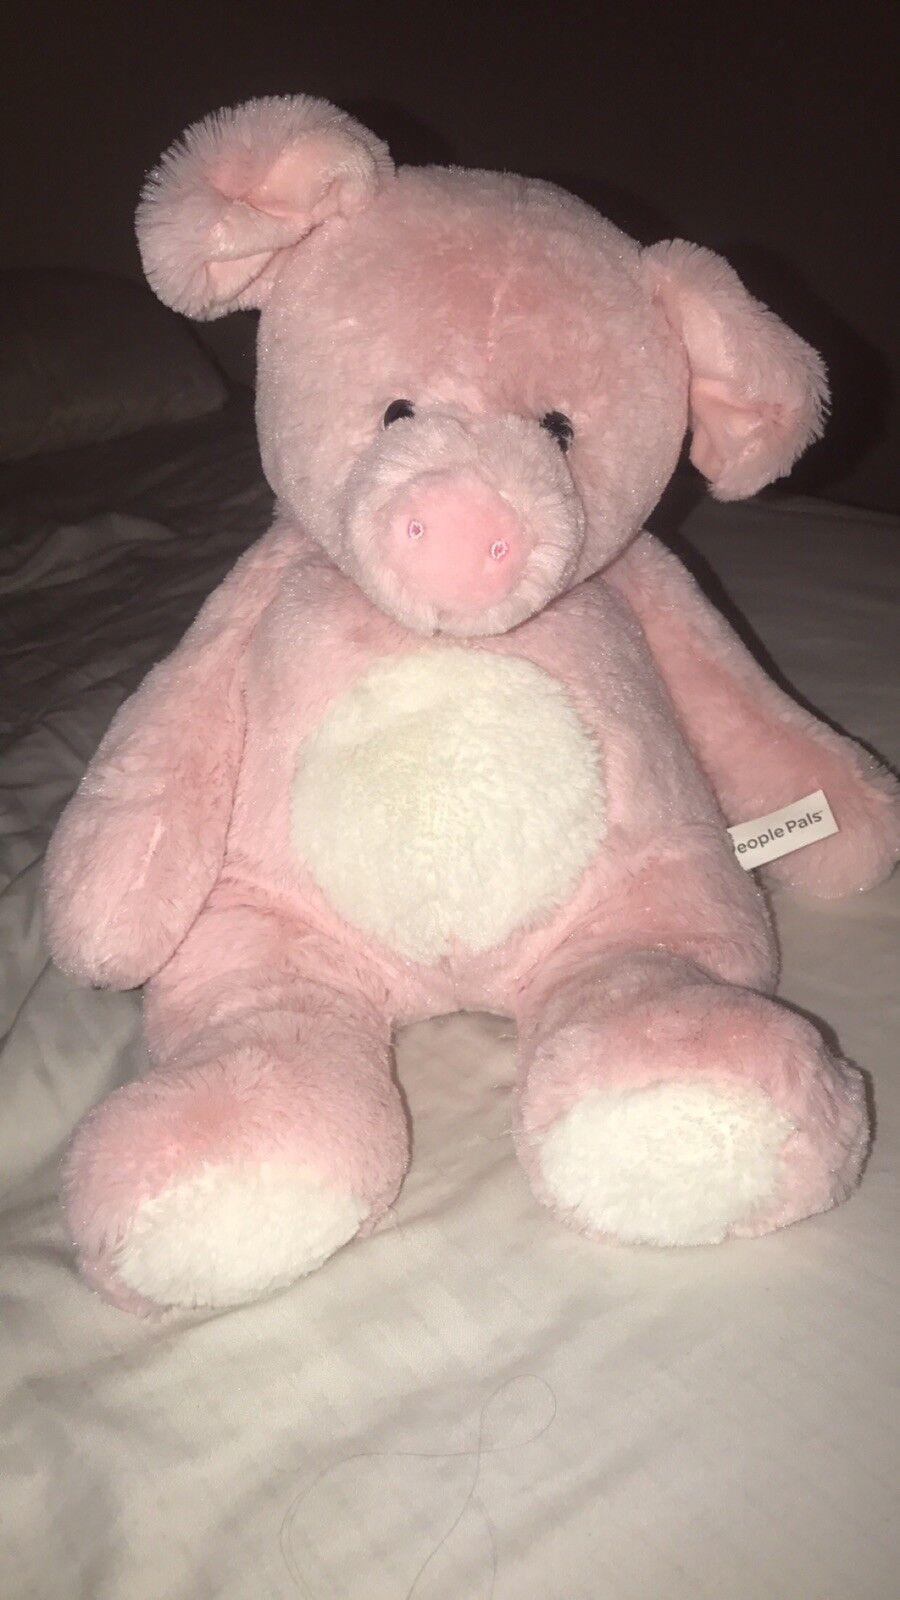 People Pals Pink White Pig Piggy Plush Stuffed Animal 16  Toy Safeway Floppy